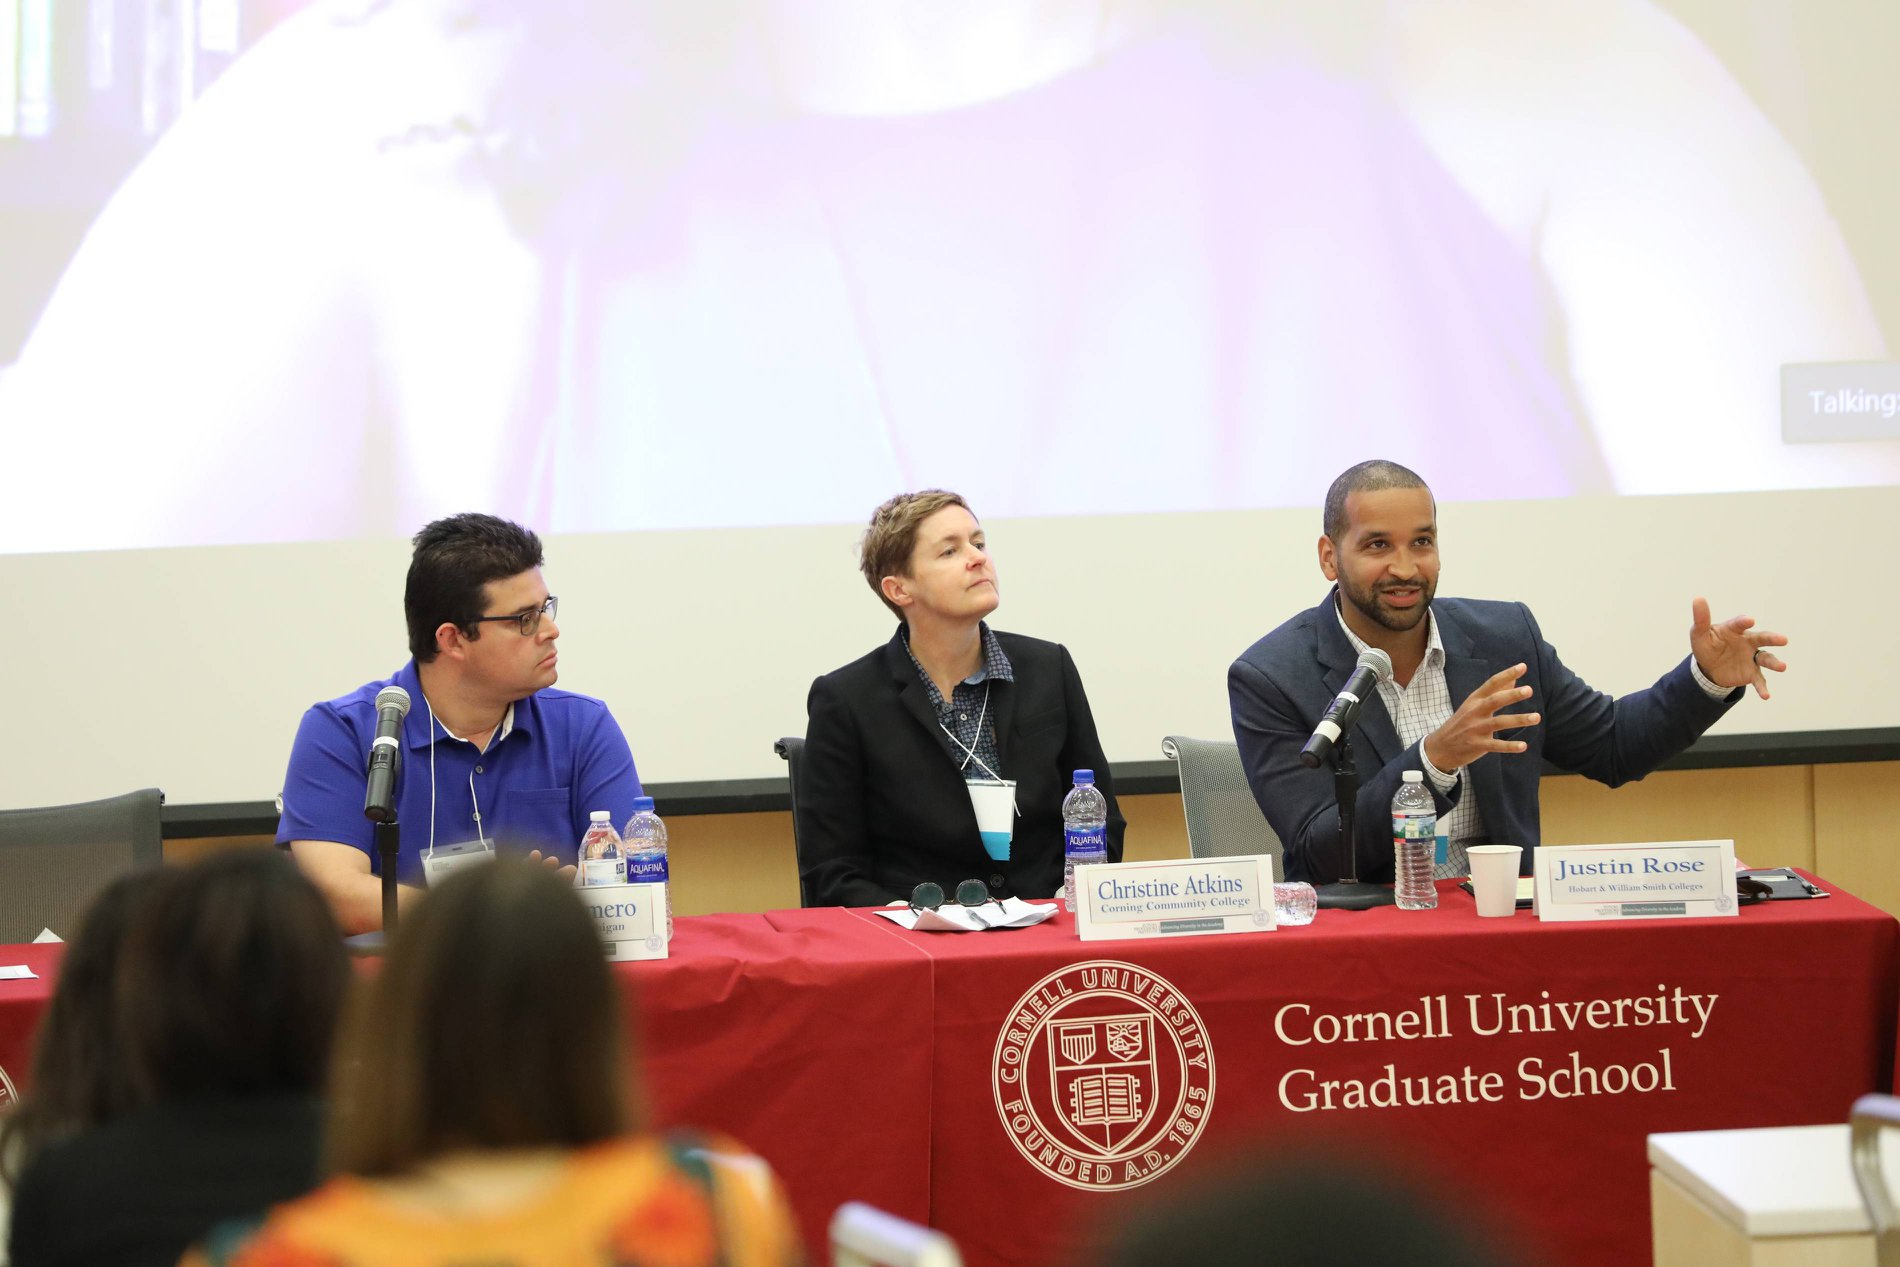 Panelists at the Future Professors Institute 2018